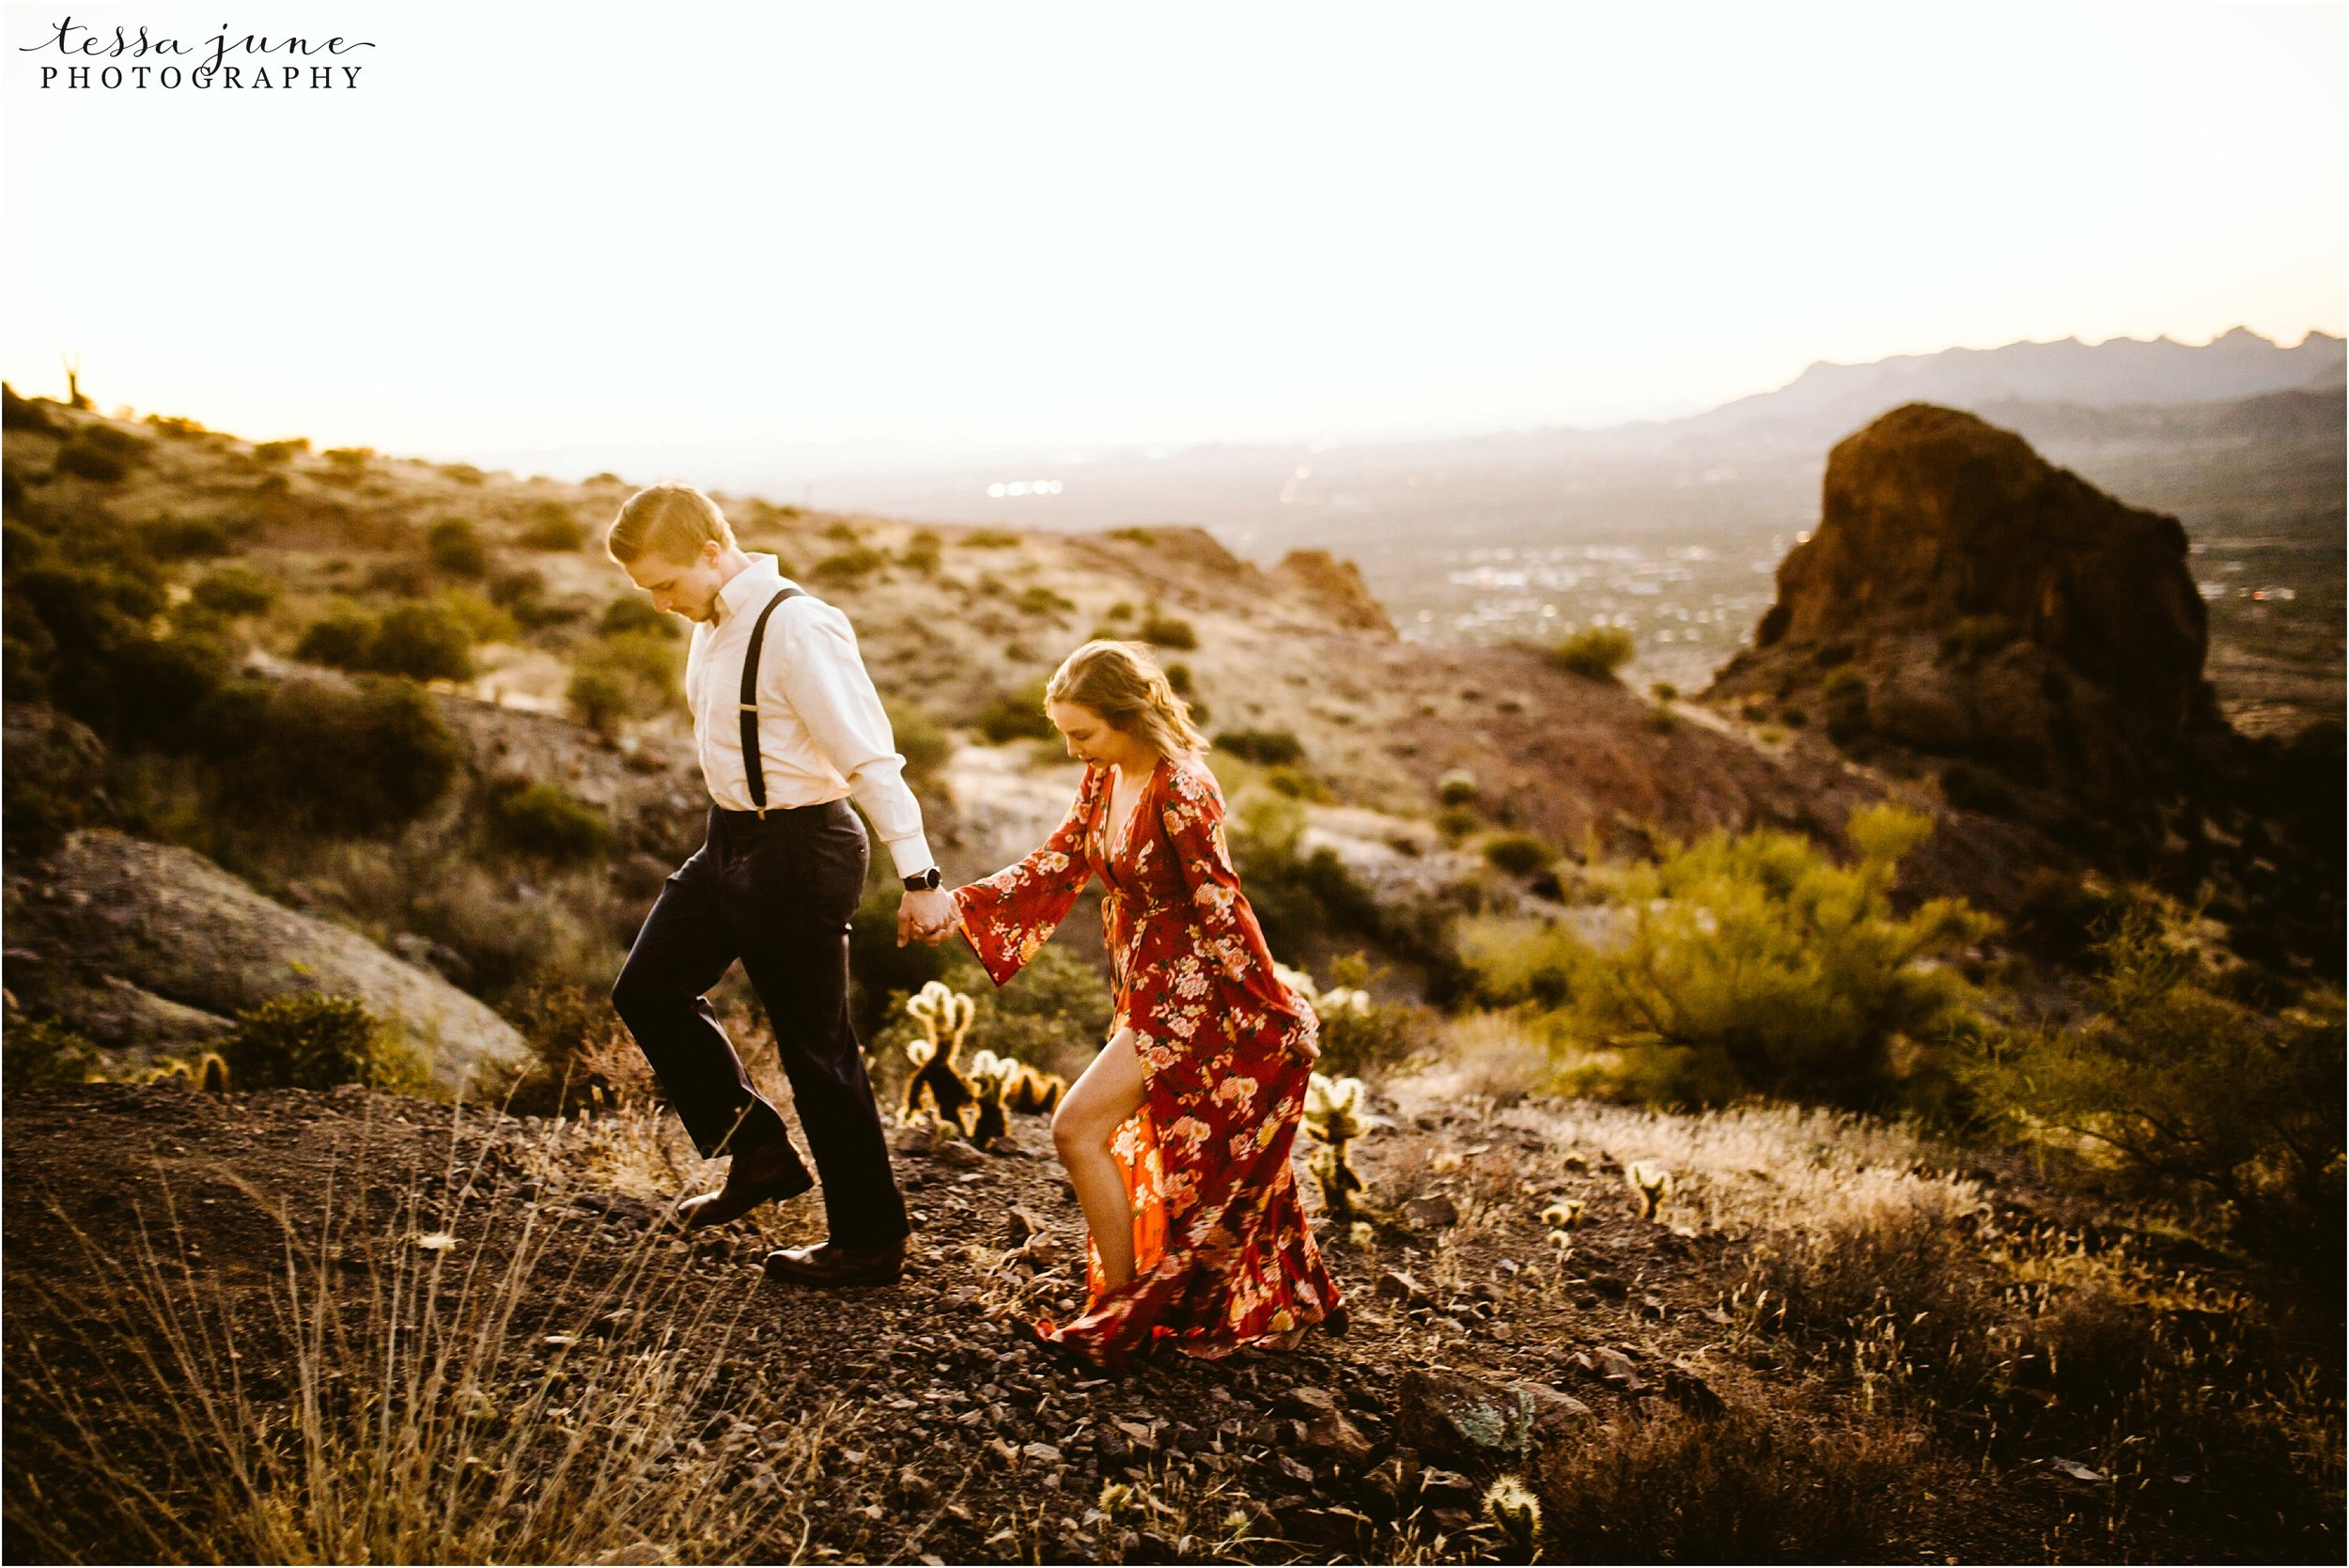 lost-dutchman-state-park-engagement-arizona-destination-photographer-phoenix-24.jpg